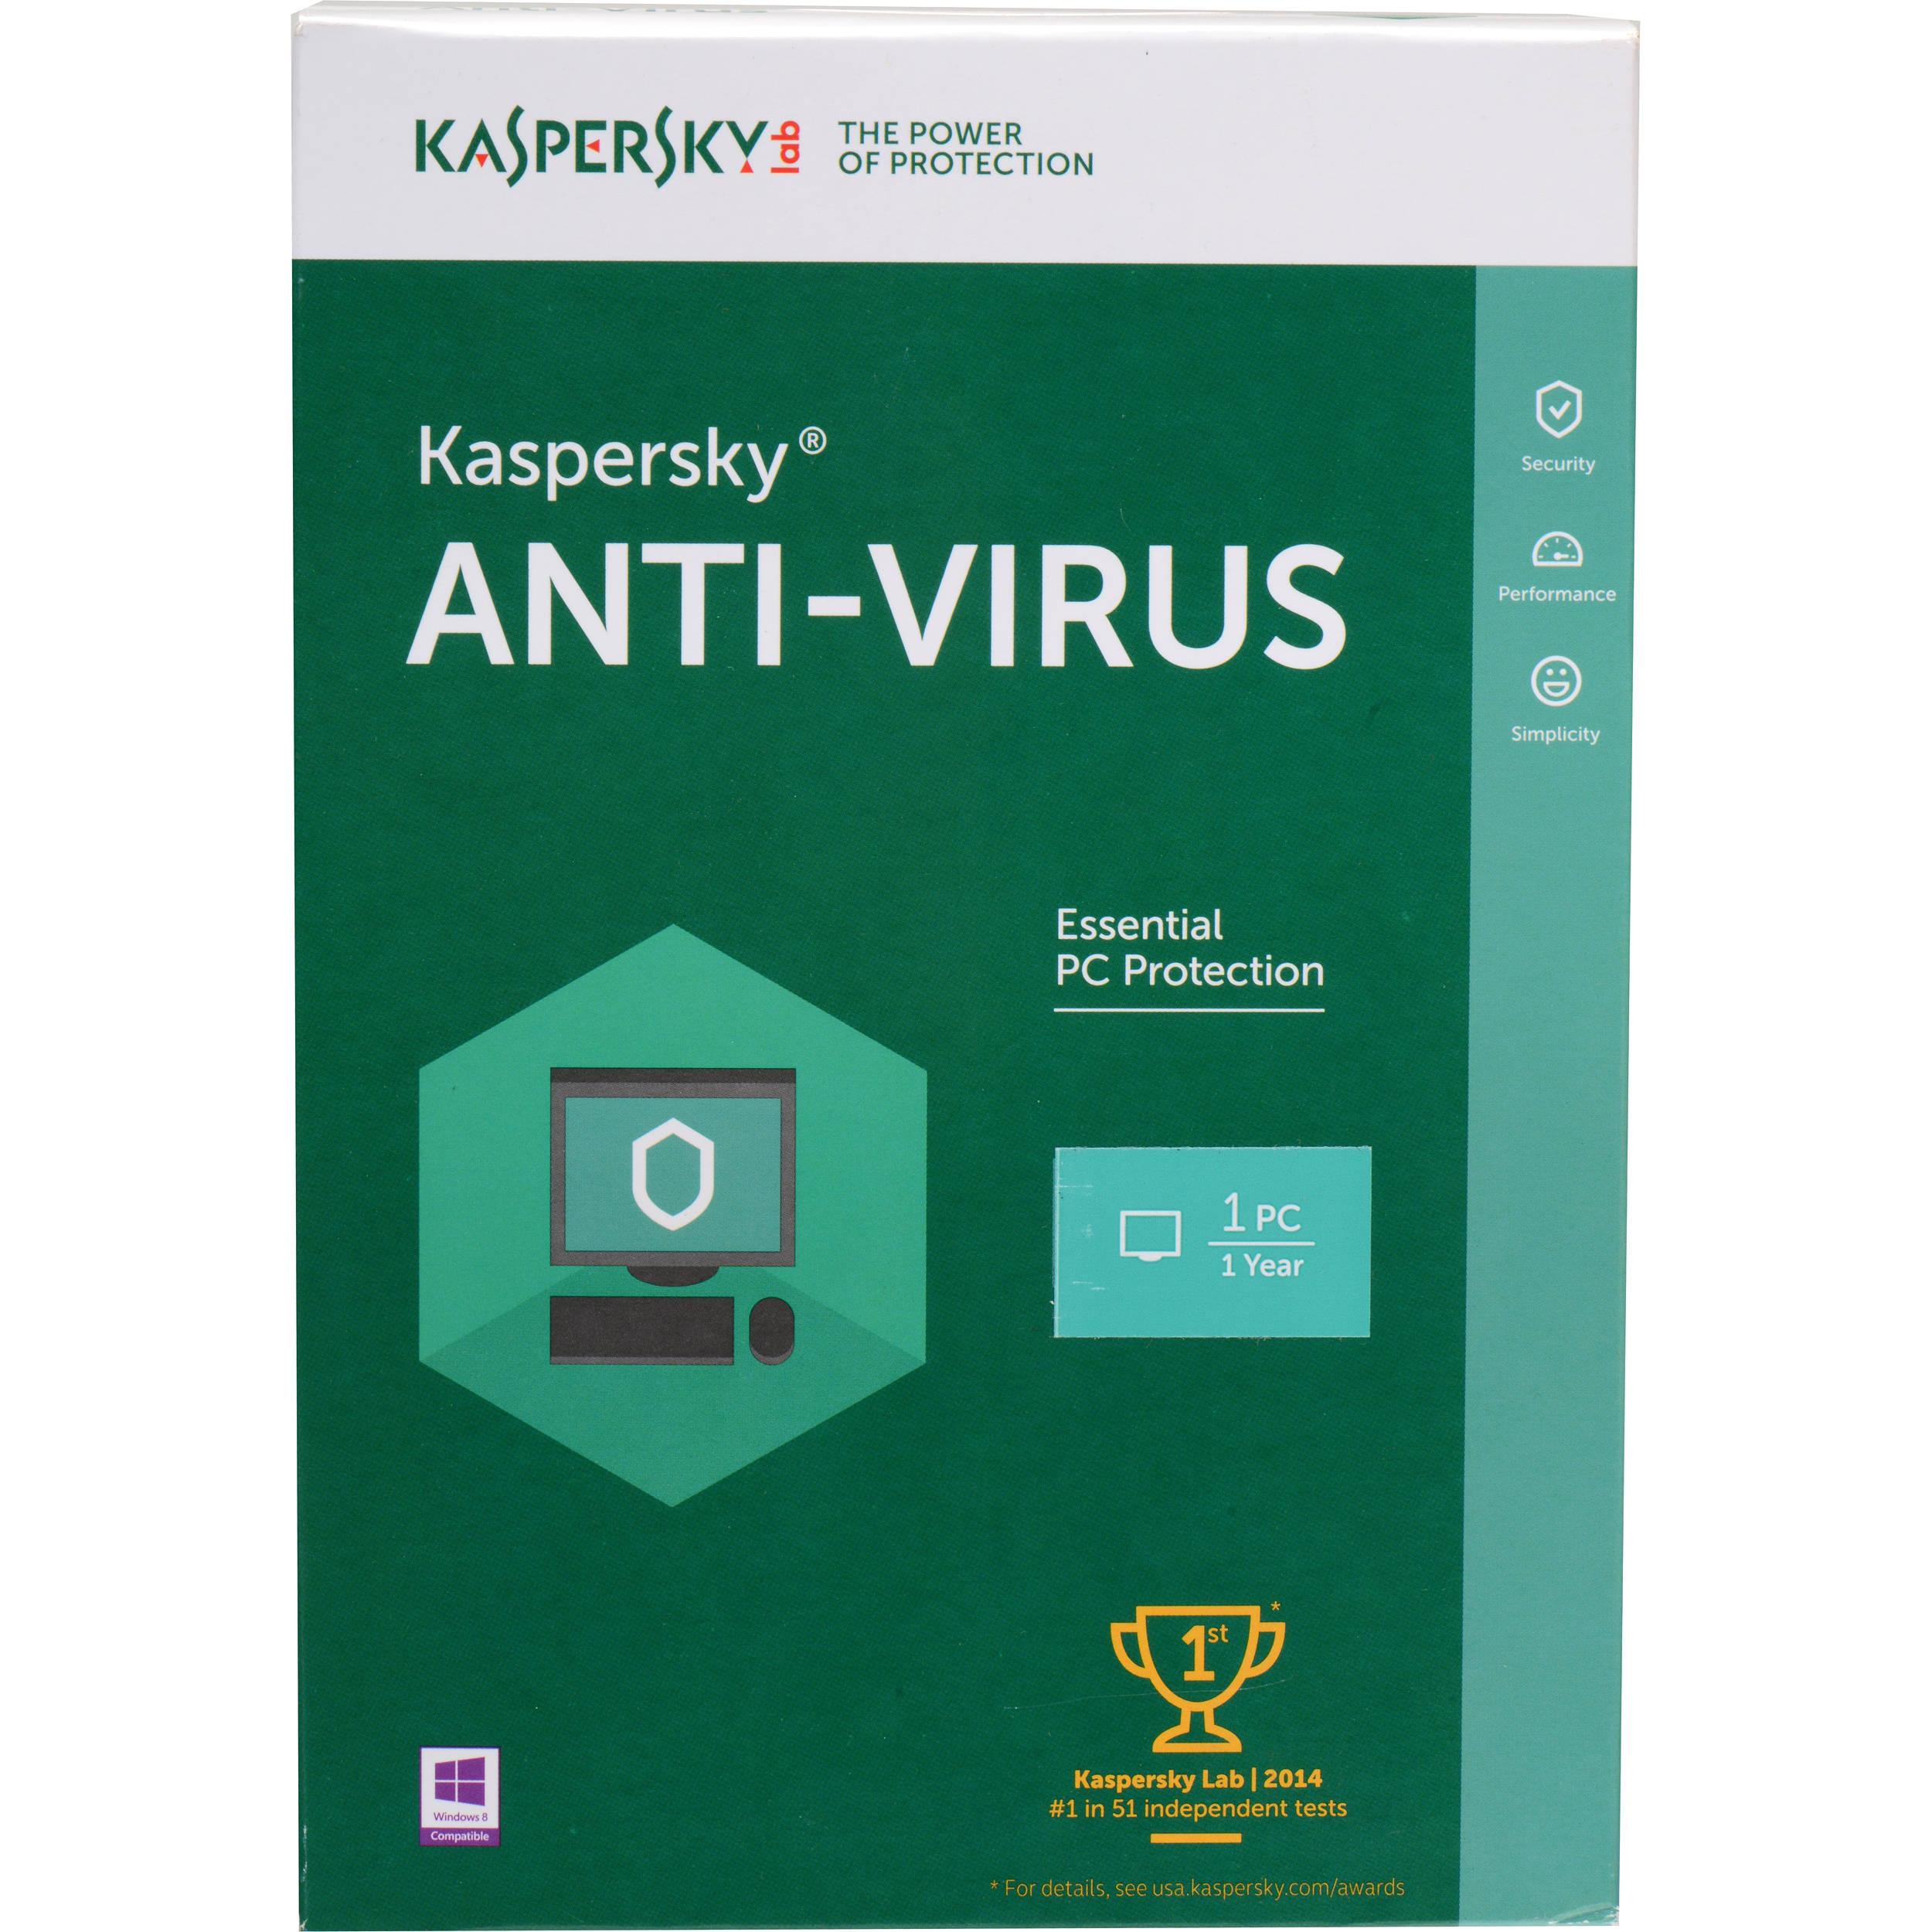 Kaspersky anti virus 2016 new crackkeygen key file free download